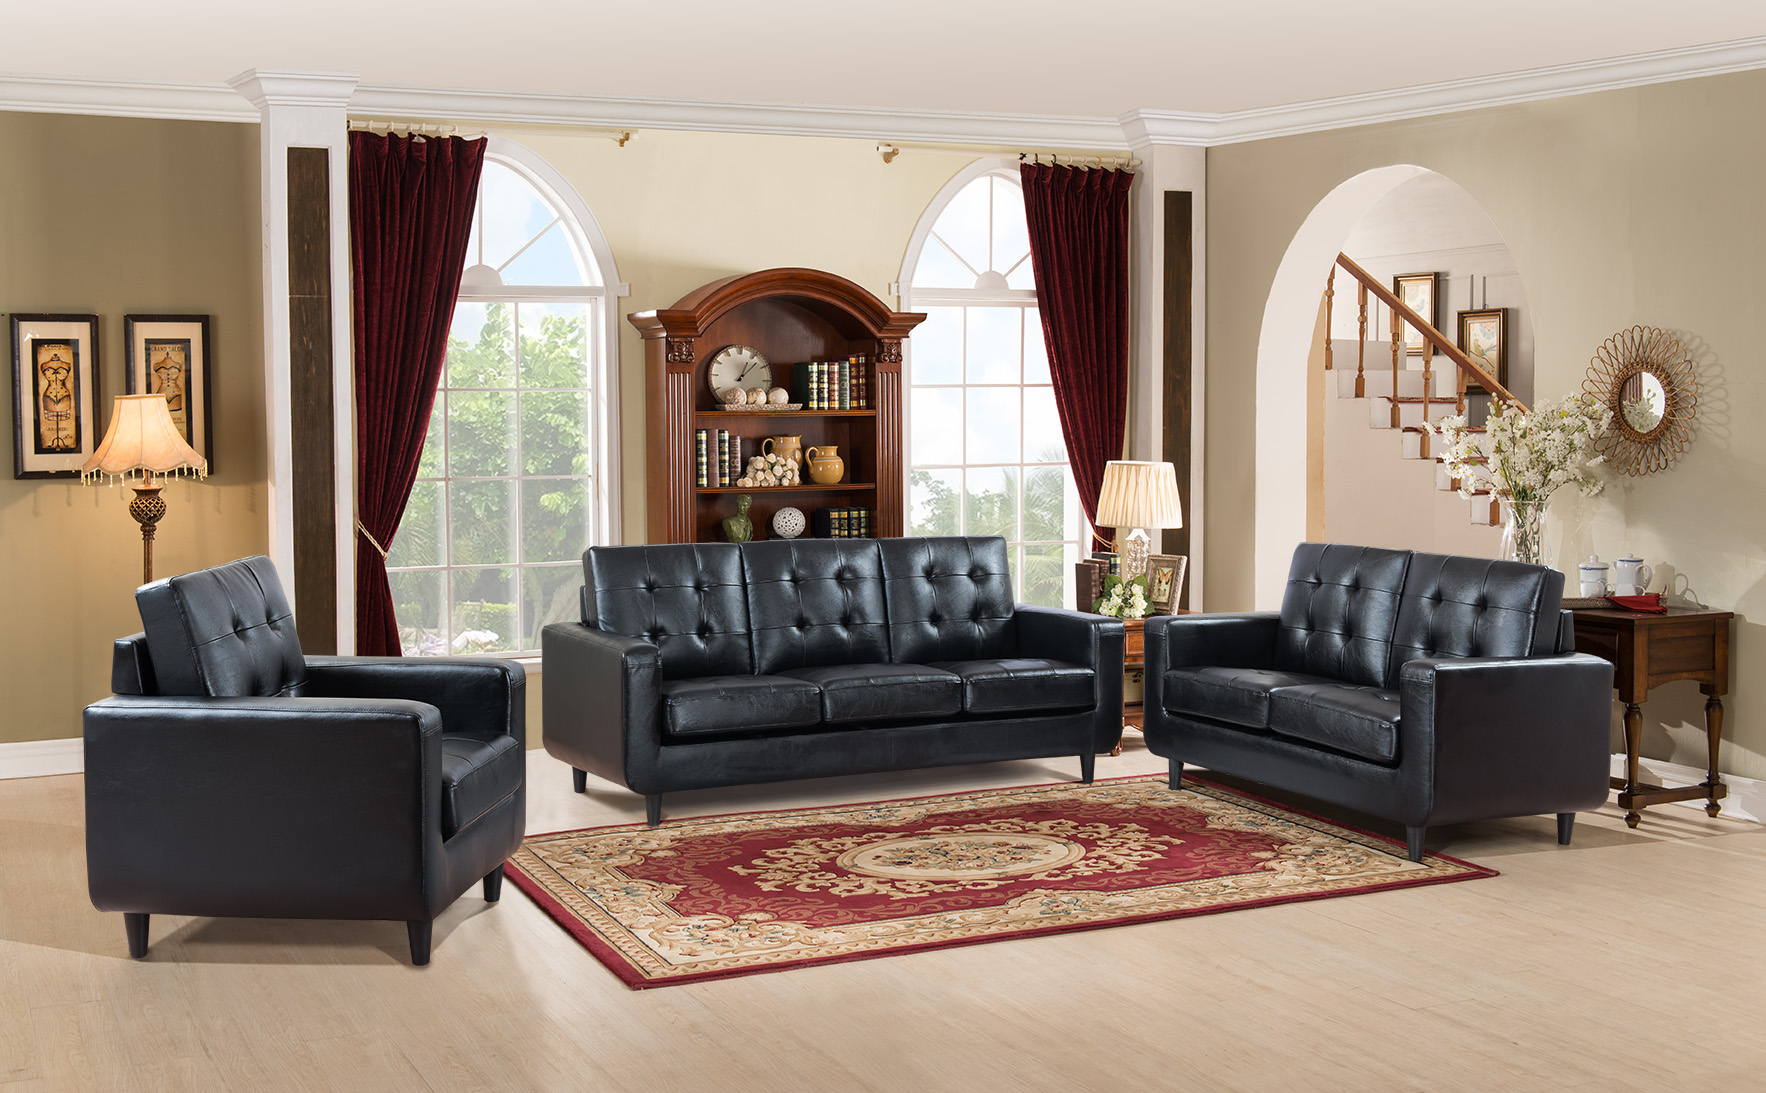 Super Sofa Love Seat Chair Modern Black Tufted Back Home Furniture 3Pc Sofa Set Lamtechconsult Wood Chair Design Ideas Lamtechconsultcom